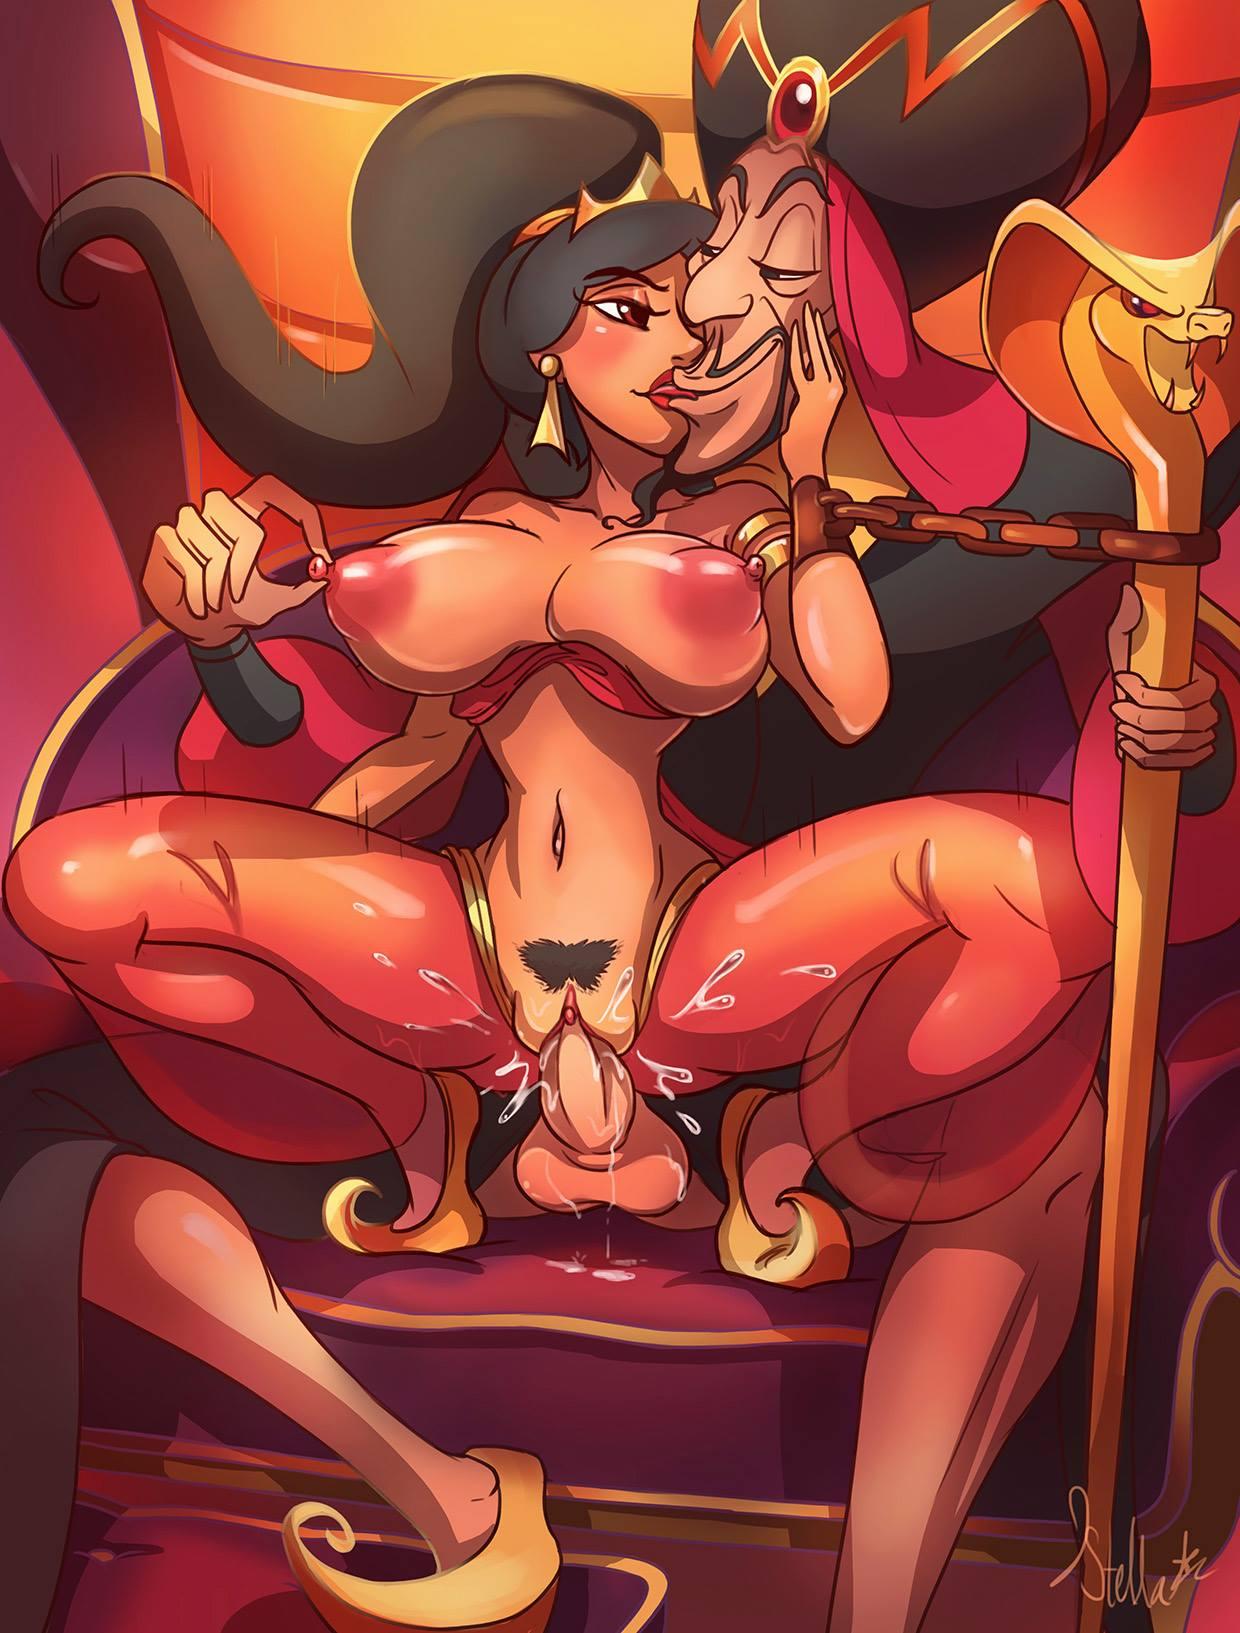 Gothic aladdin and jasmine hentai niud wide hip